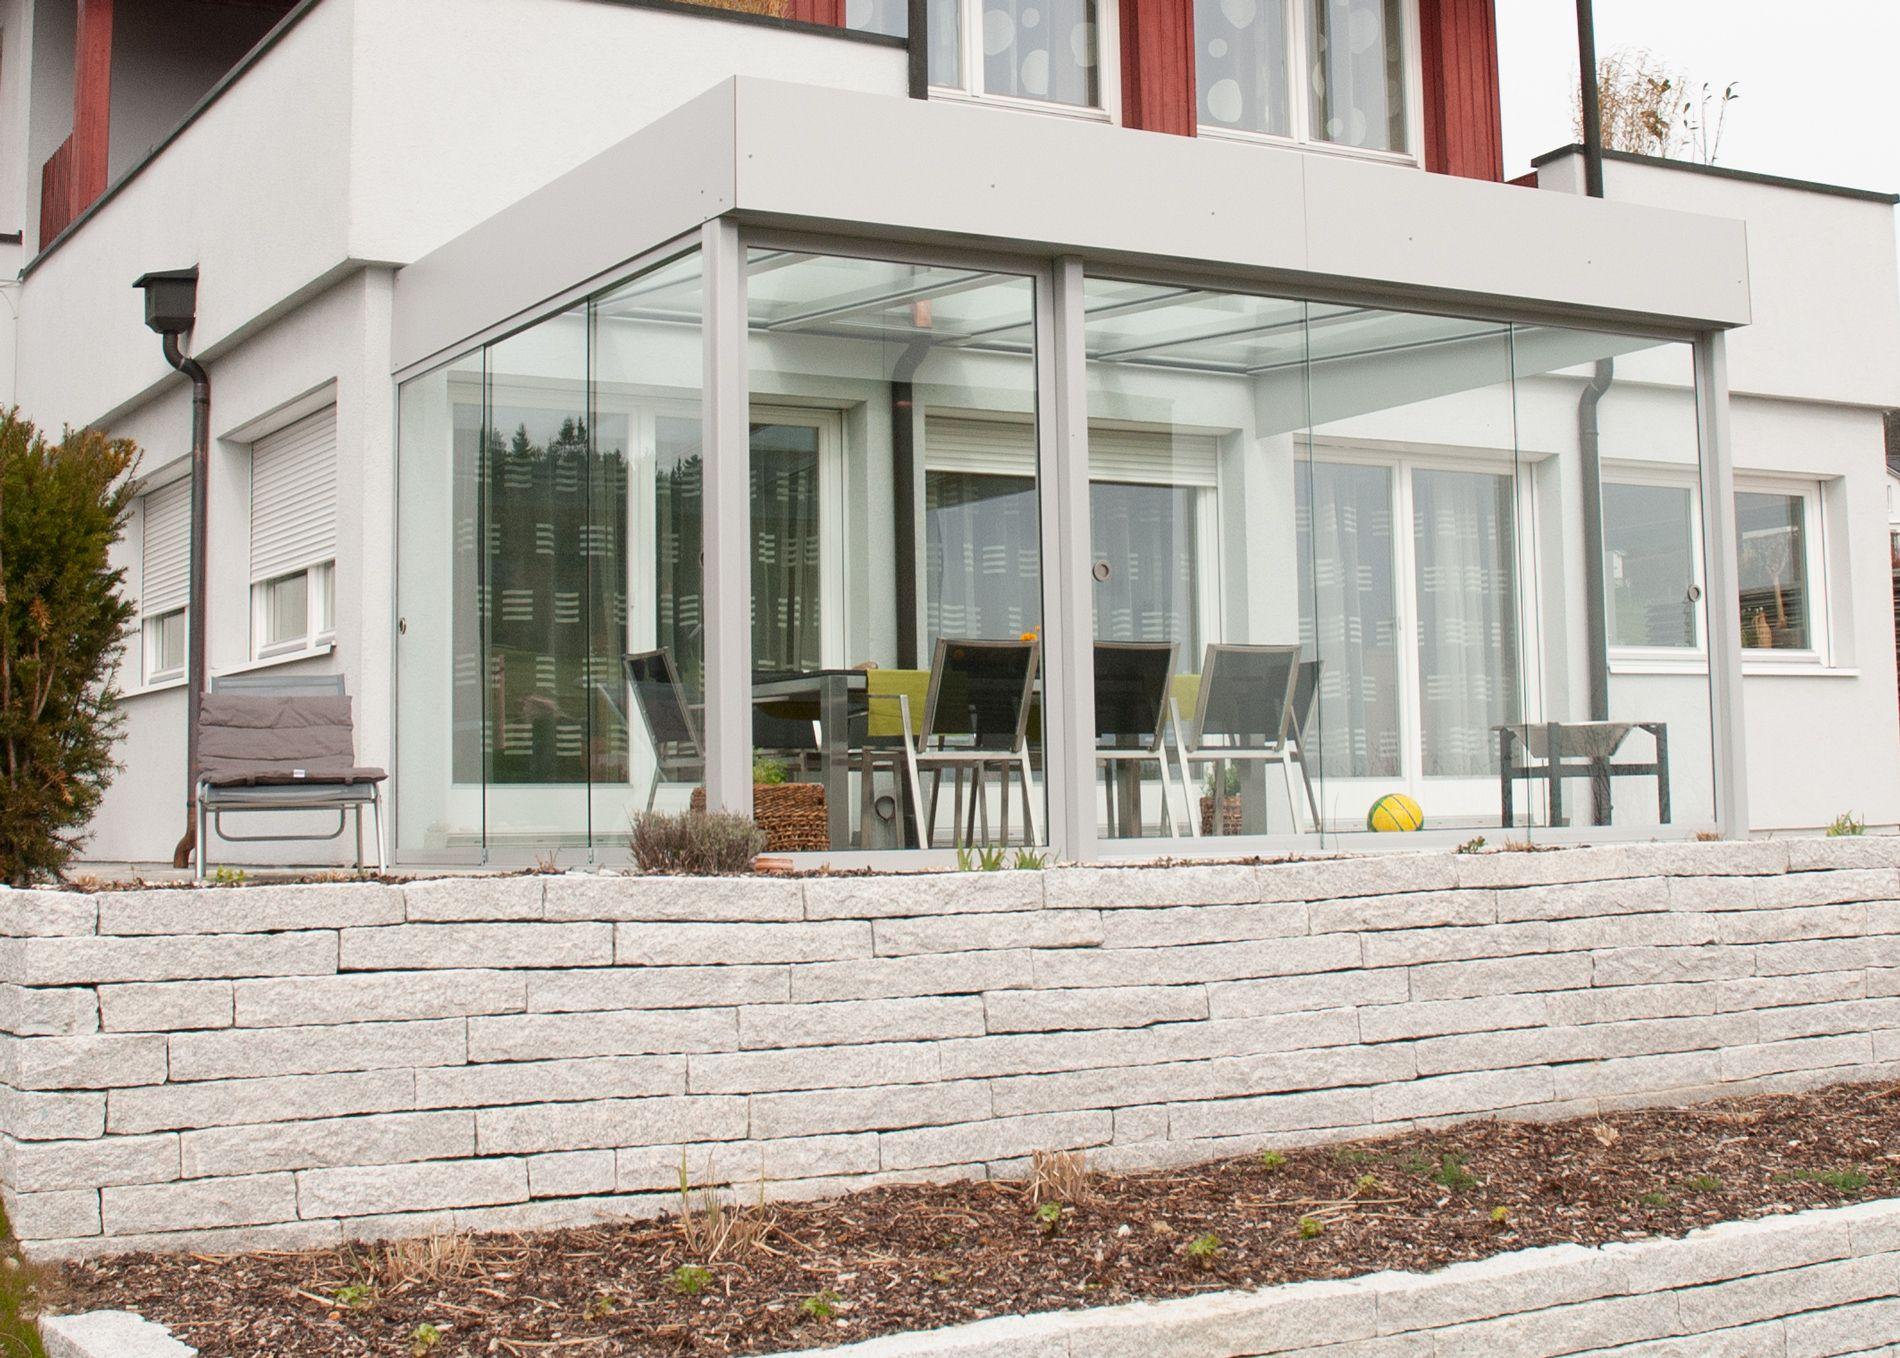 Terrassenuberdachung Glasdach Uberdachung Terrasse Terrassenuberdachung Uberdachungen